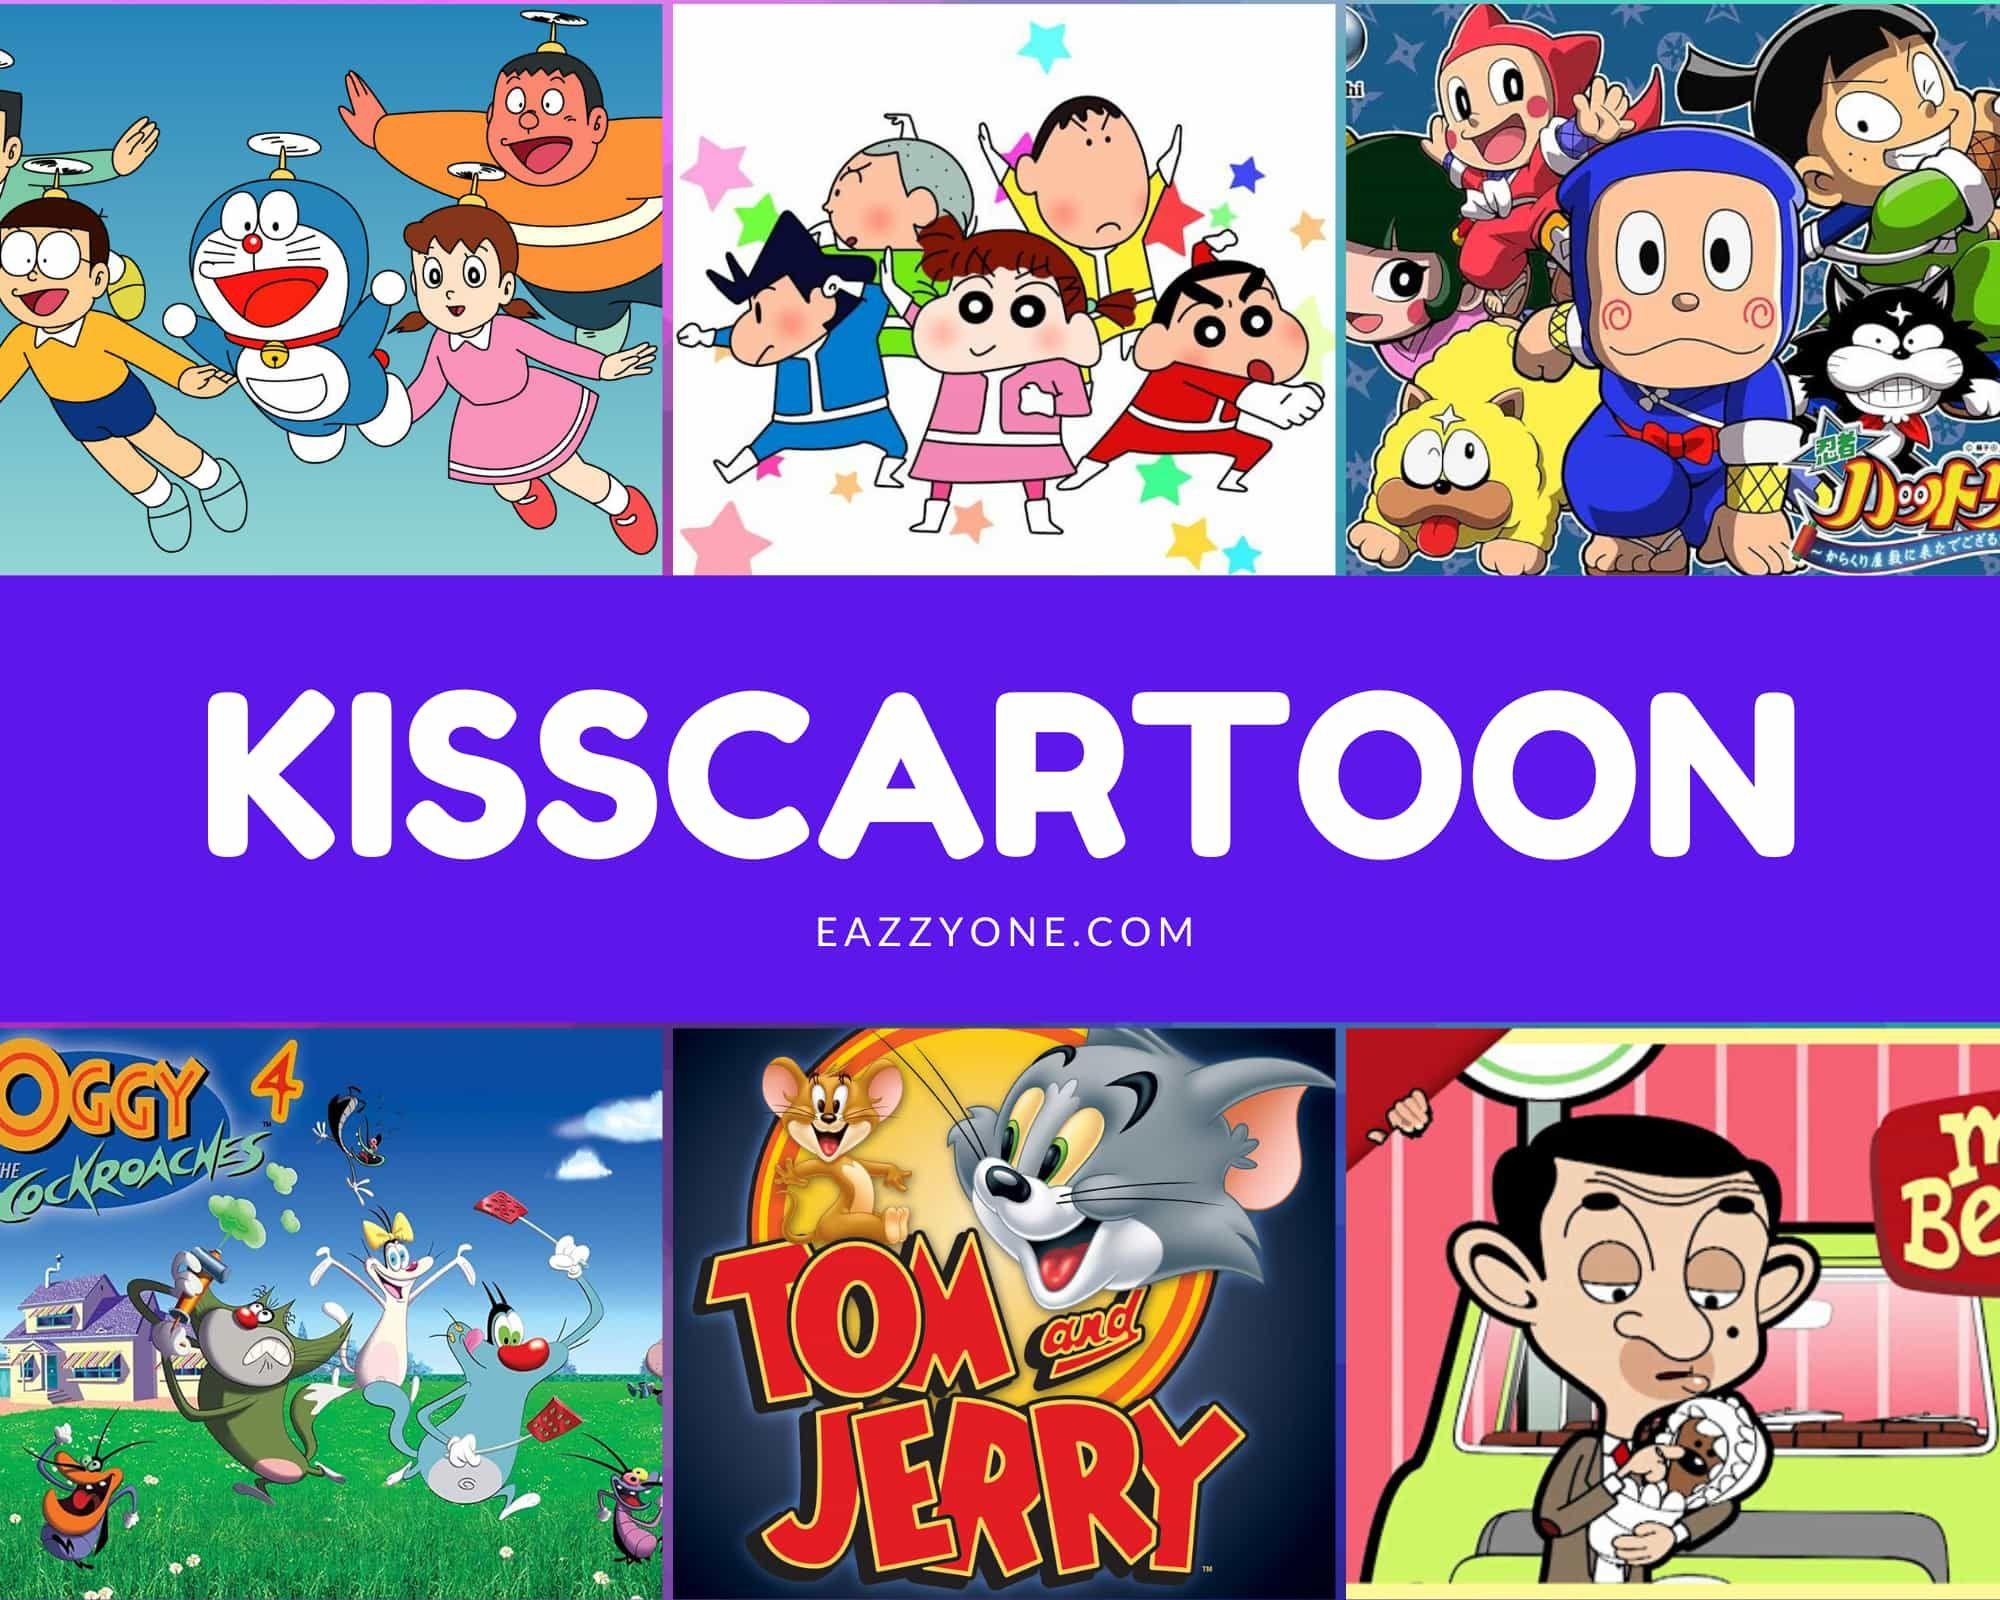 Watch Cartoon Animation Movies On Kisscartoon Website Watch Cartoons Cartoon Movies Animated Movies